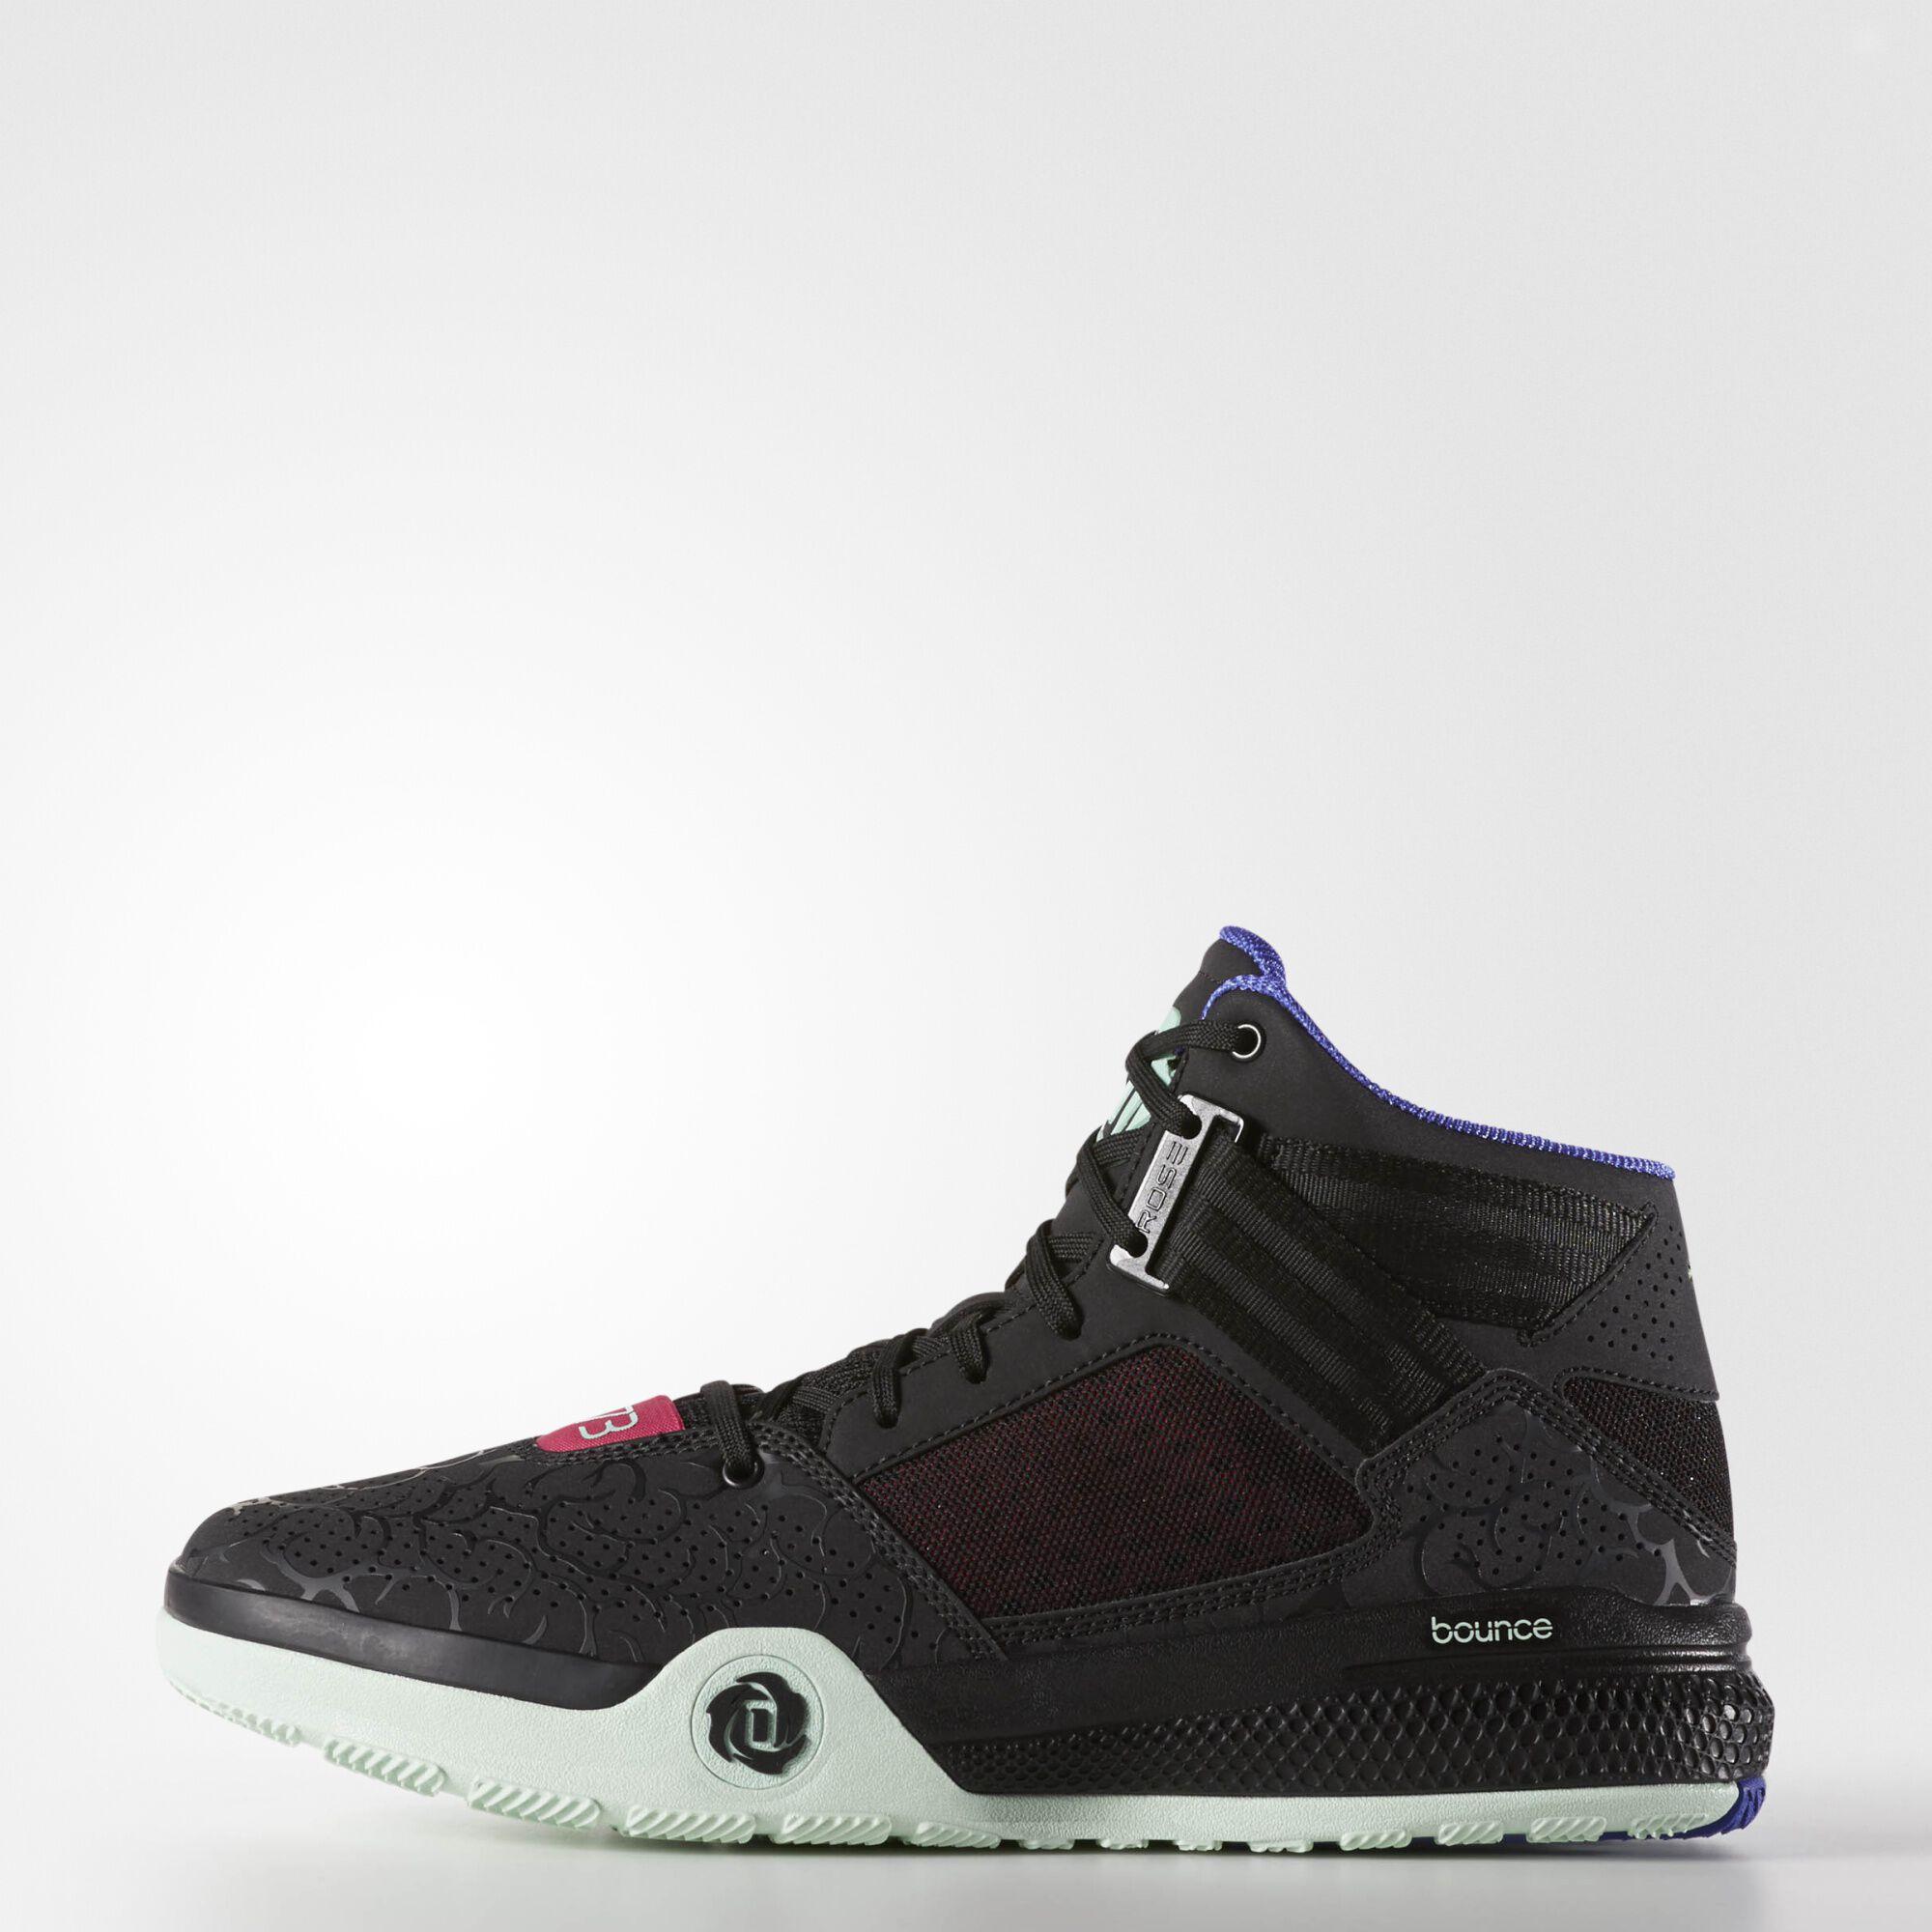 adidas derrick rose 773 light red basketball shoes